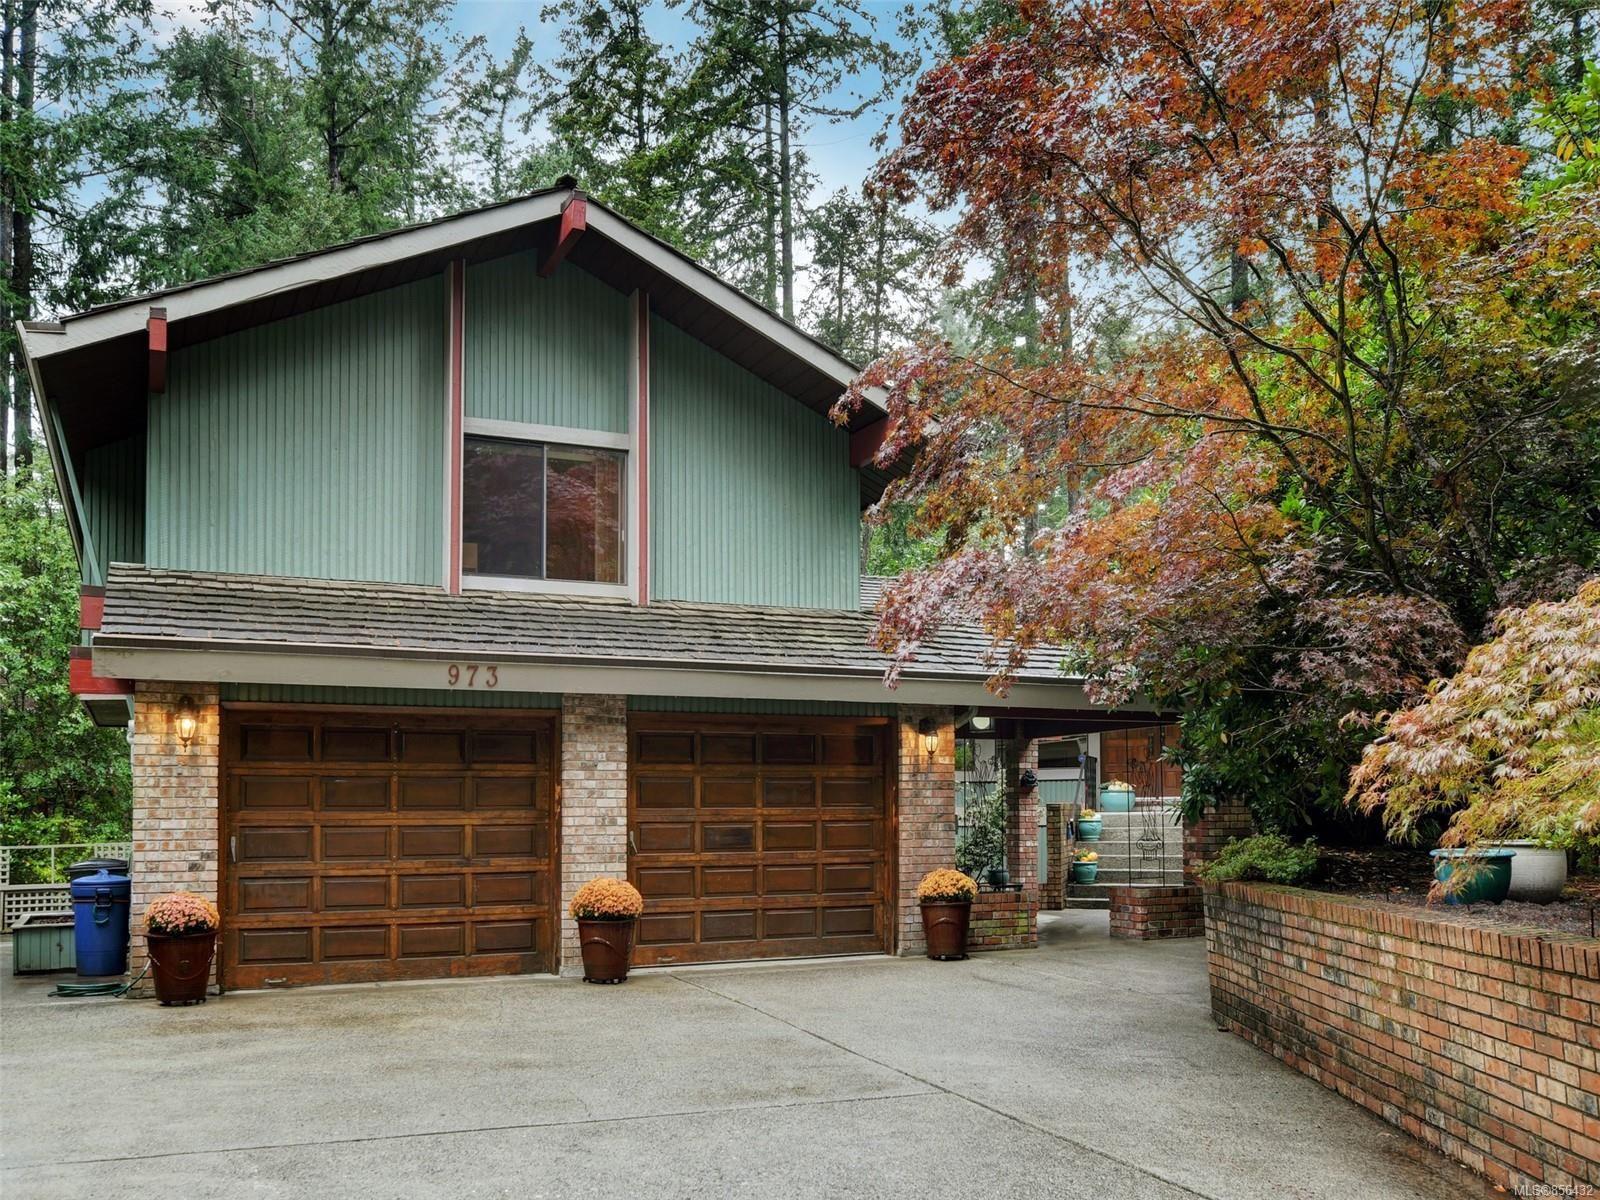 Main Photo: 973 Wagonwood Pl in Saanich: SE Broadmead House for sale (Saanich East)  : MLS®# 856432